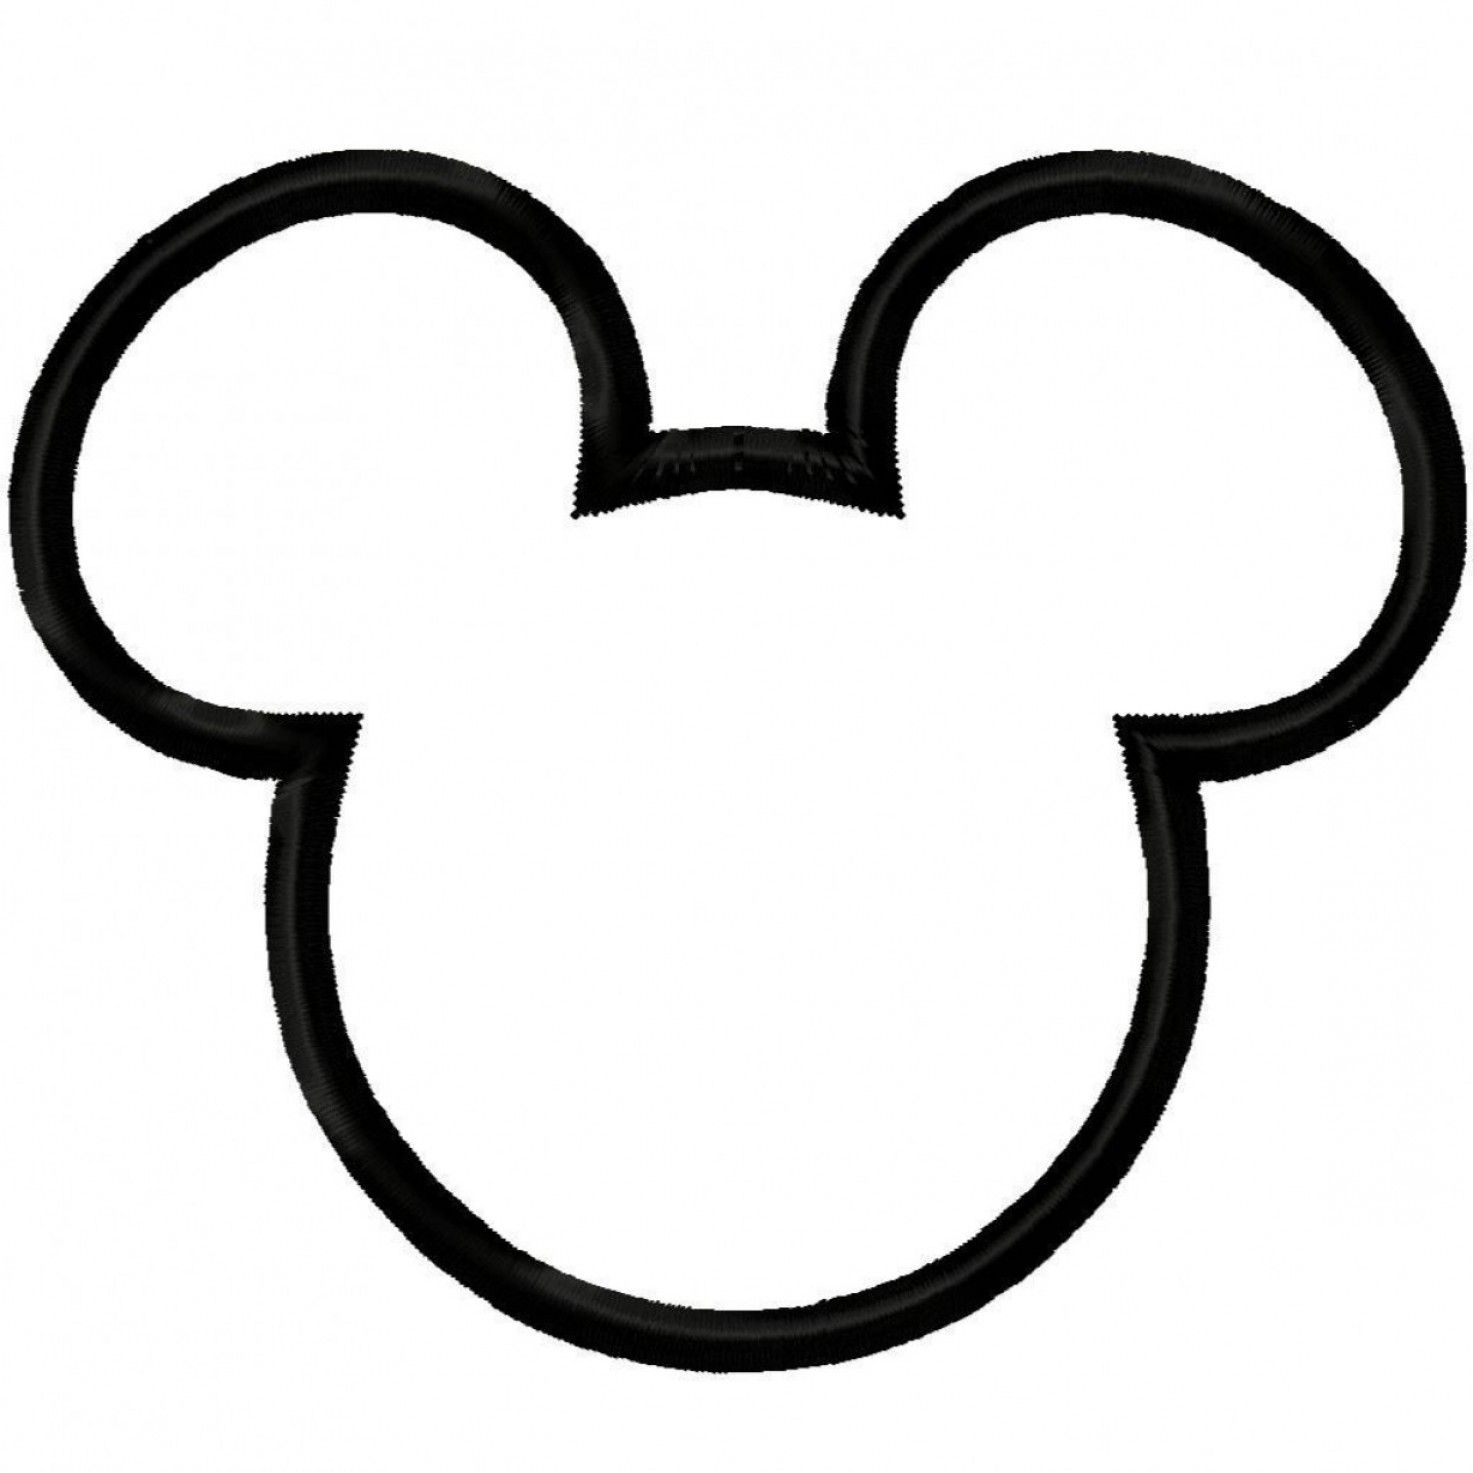 Mickey Vector Mickey Mouse Ears Clipart Black And White Mickey Mouse Template Mickey Mouse Silhouette Mickey Mouse Head